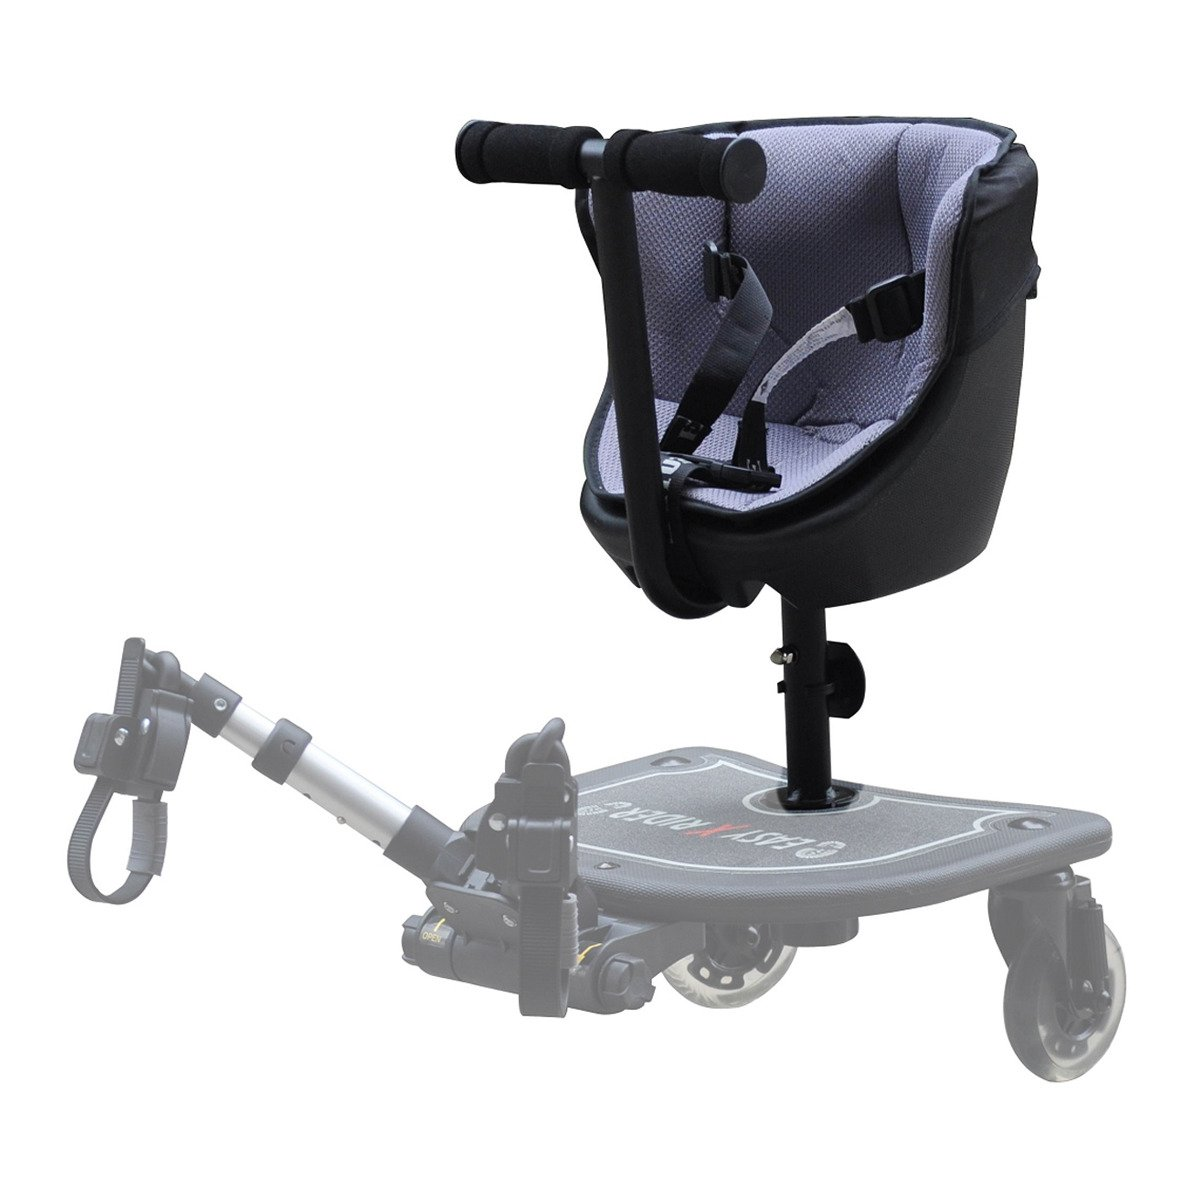 Asiento Para Patinete Easy X Rider para carro - Negro -